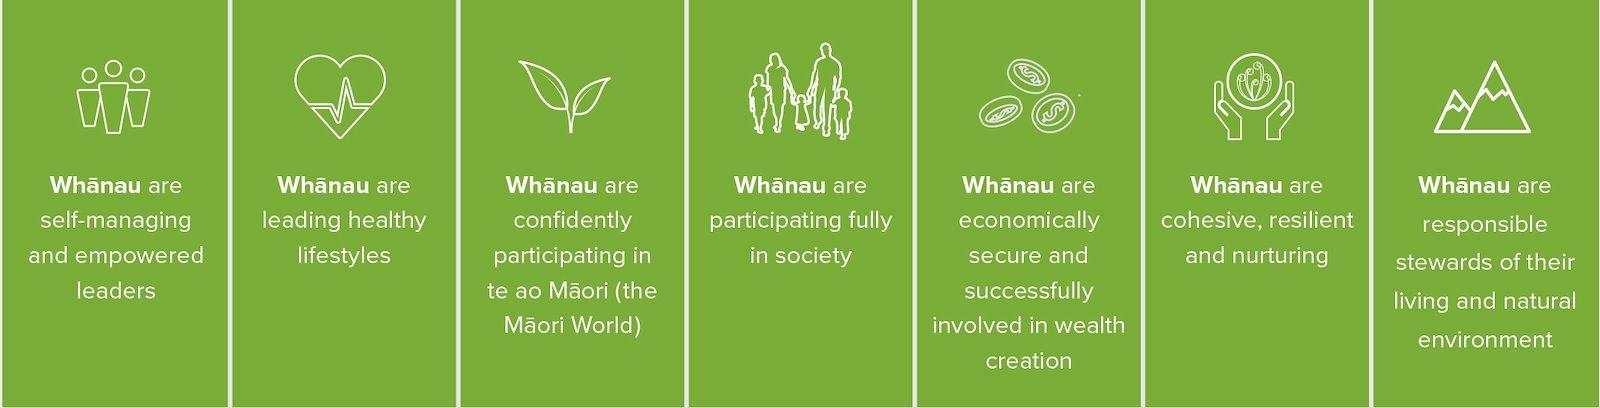 Whānau Ora outcomes